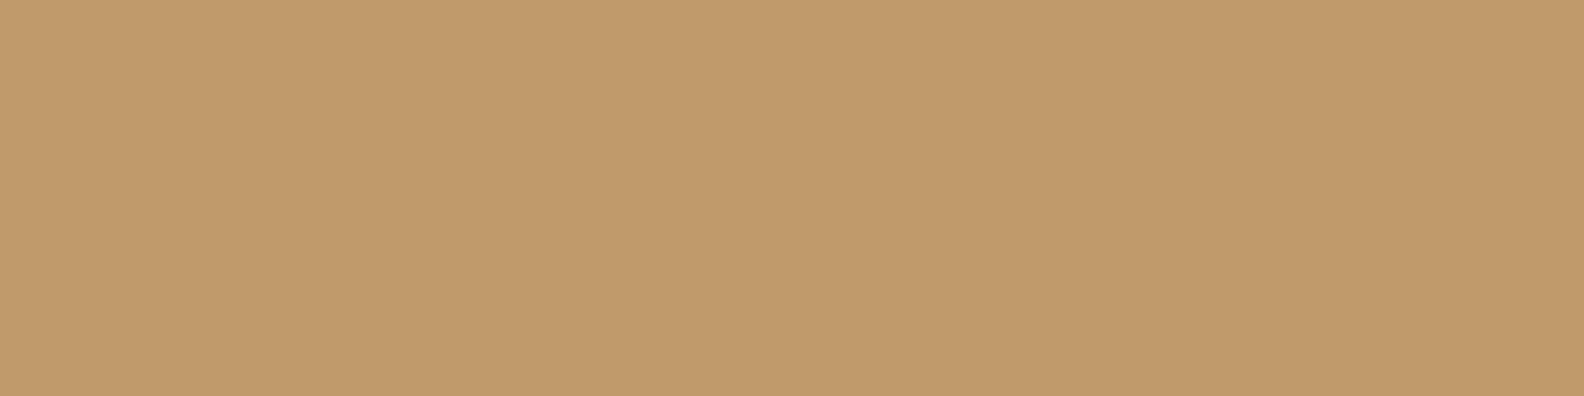 1584x396 Desert Solid Color Background